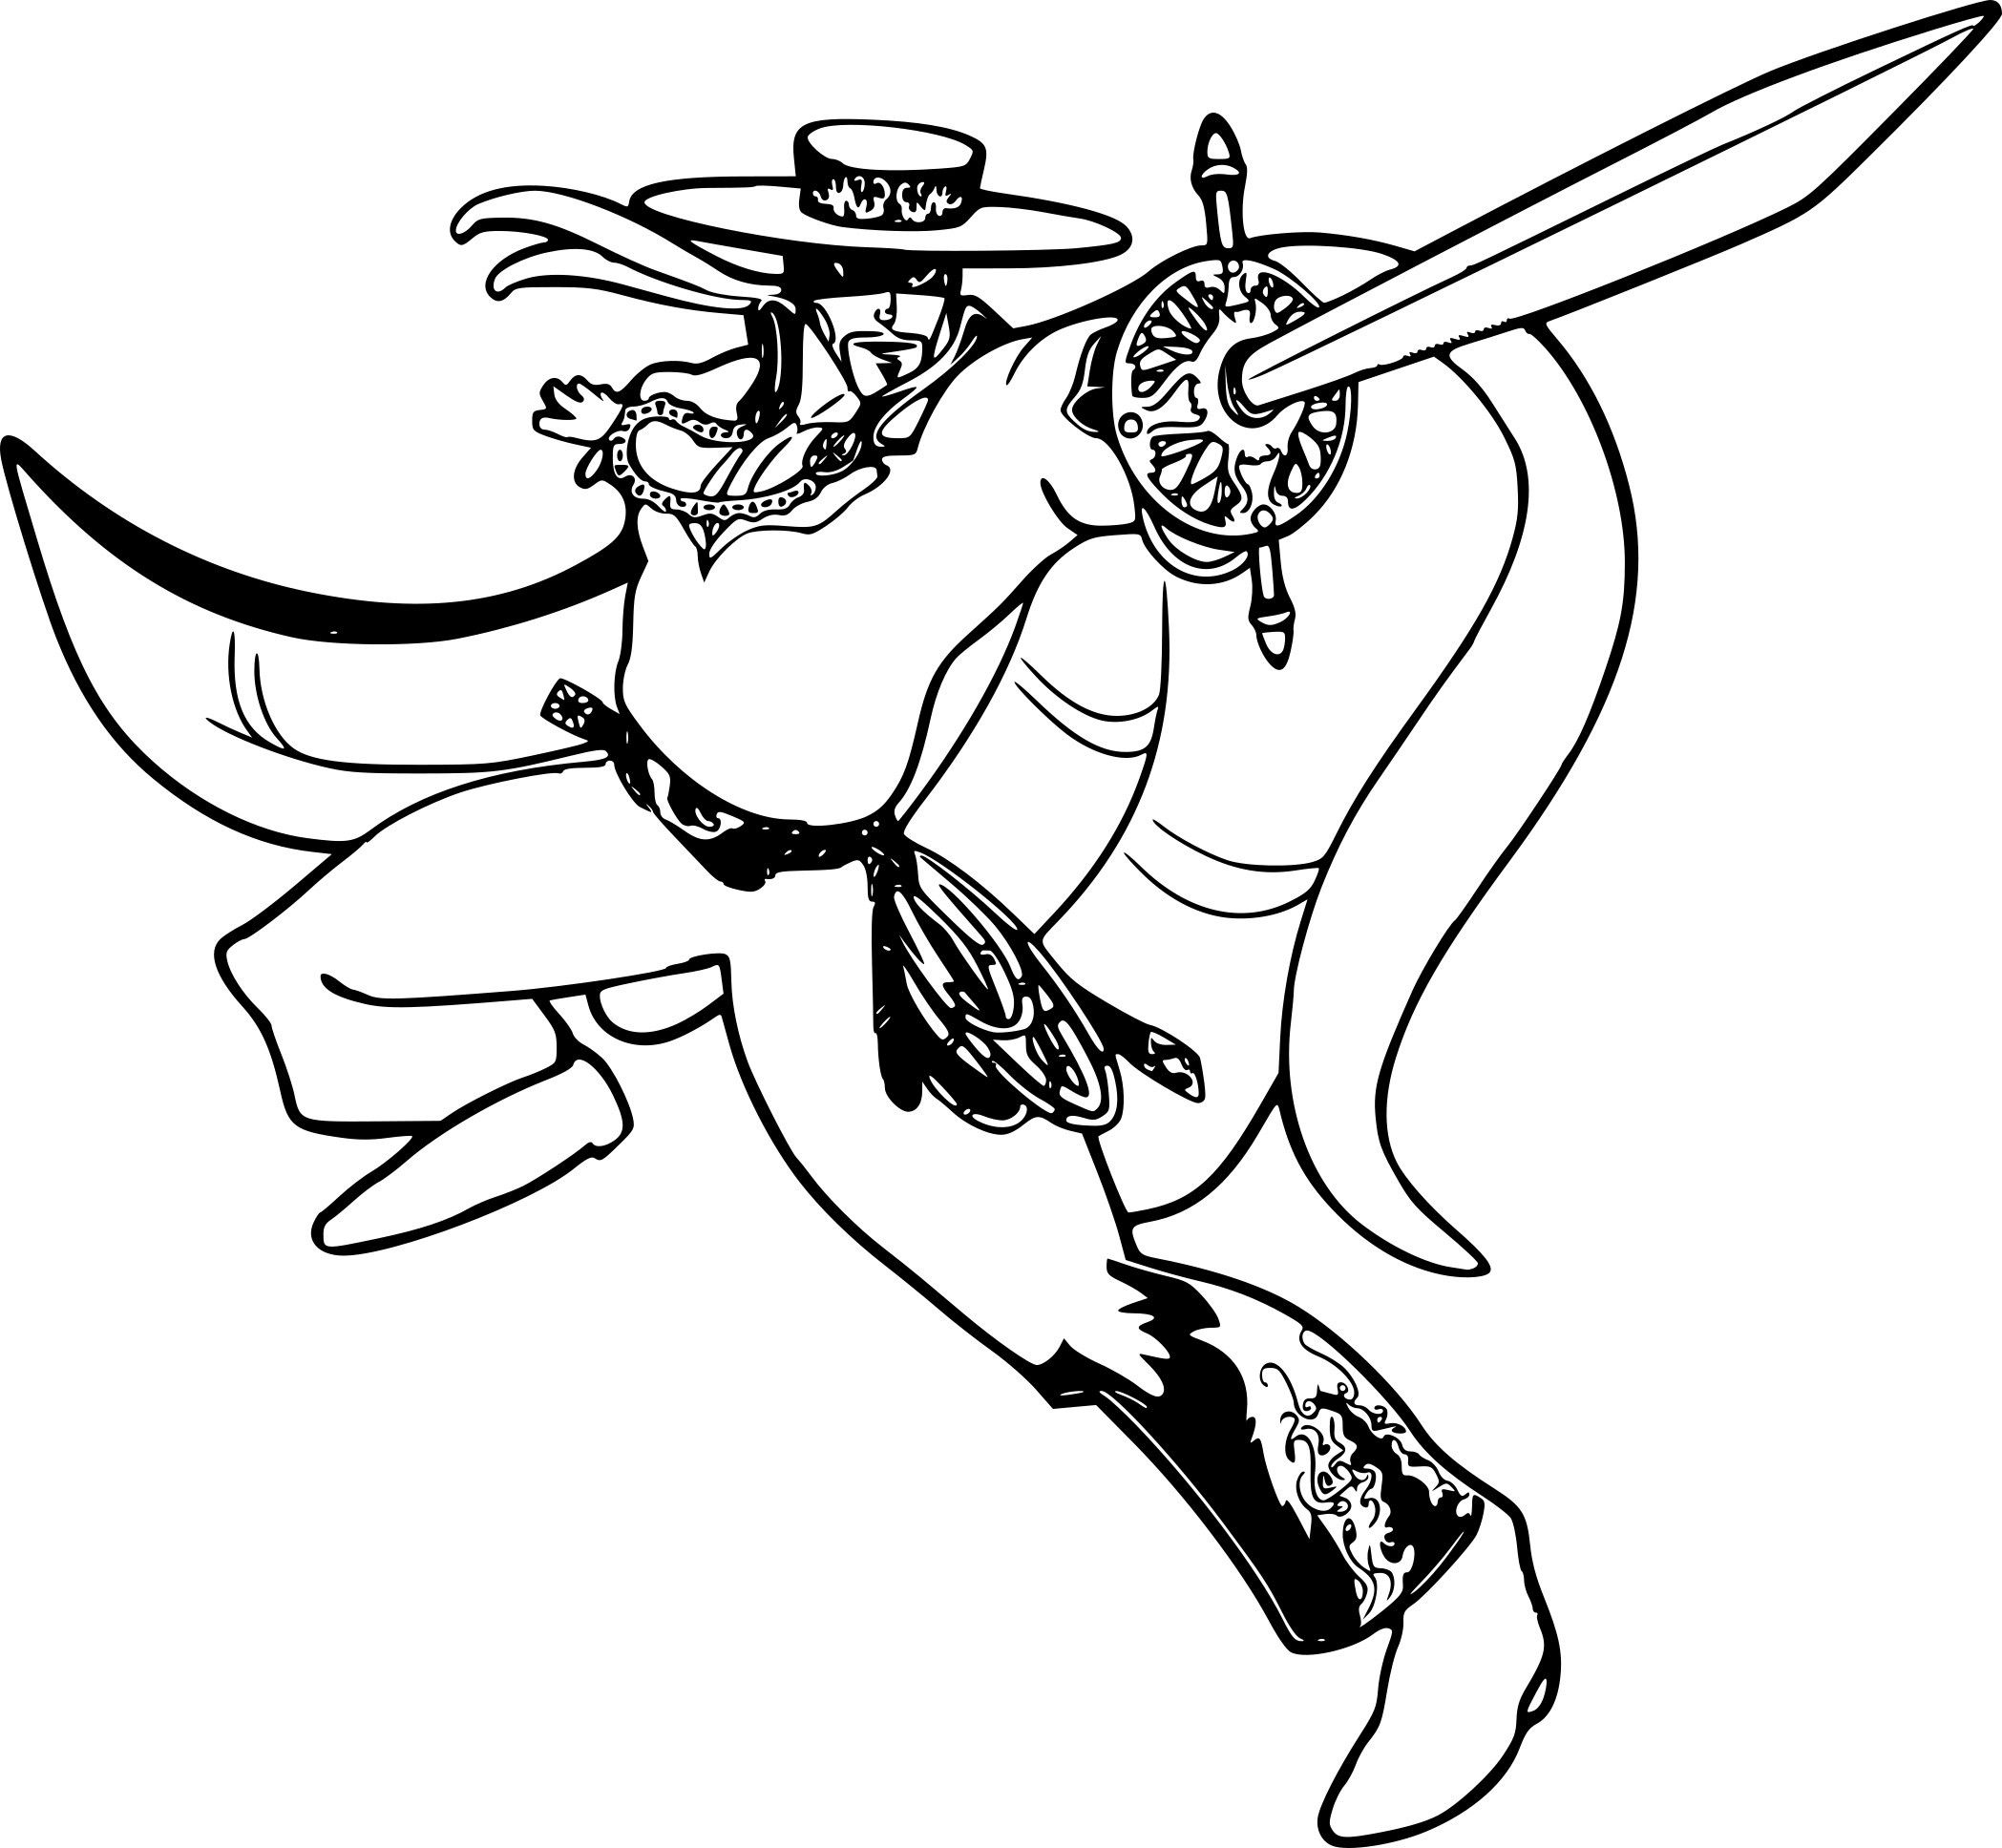 Dessin Coloriage Zorro 86 Pour Votre Pages A Colorier Pour Des Idees D Adultes With Coloriage Zor Coloring Pages Animated Cartoon Characters Christian Coloring